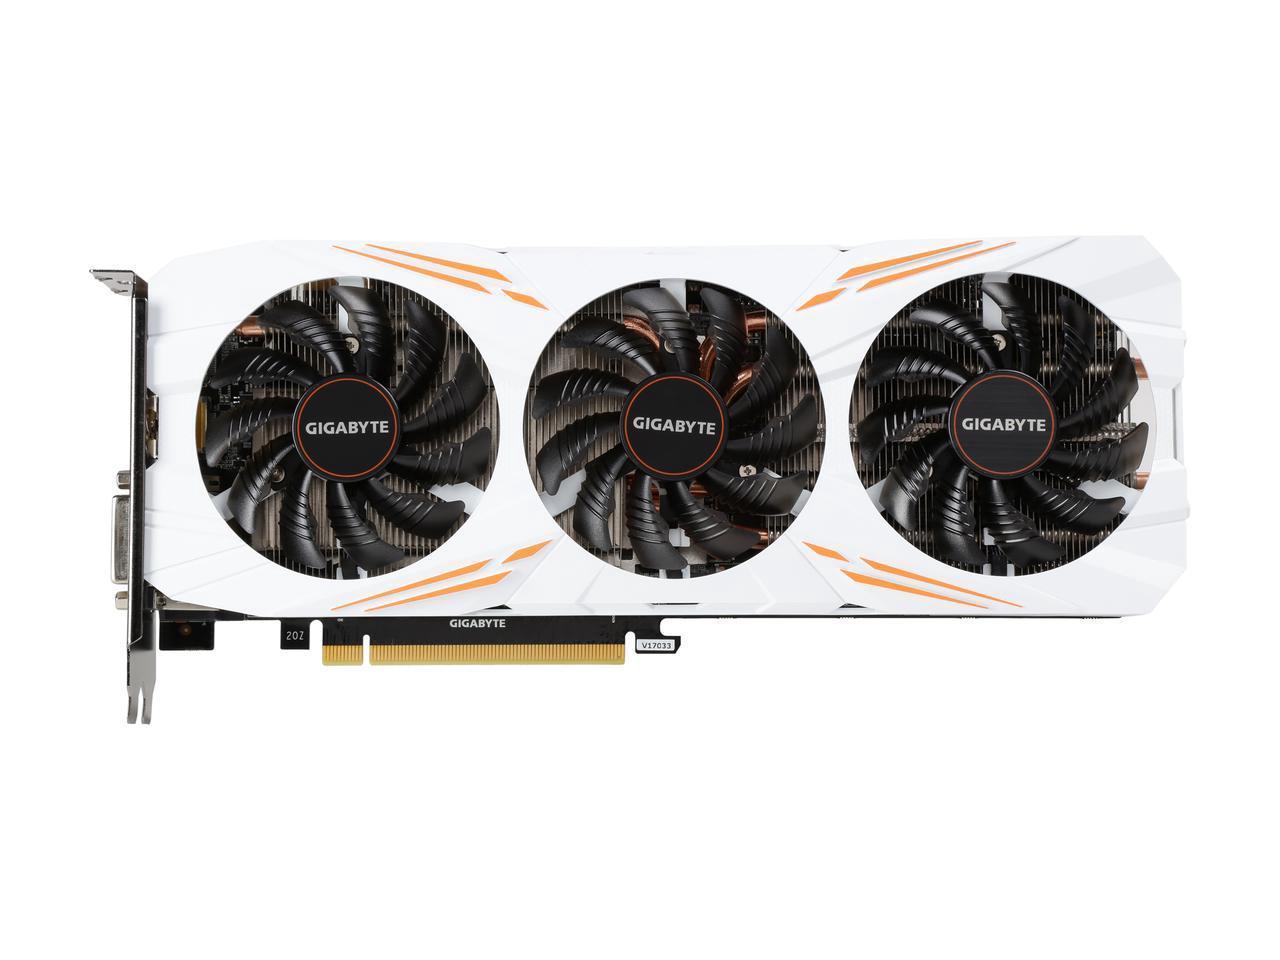 Gigabyte VGA GeForce® GTX 1080 Ti Gaming OC 11G  [GV-N108TGAMING OC 11GD] - Putih